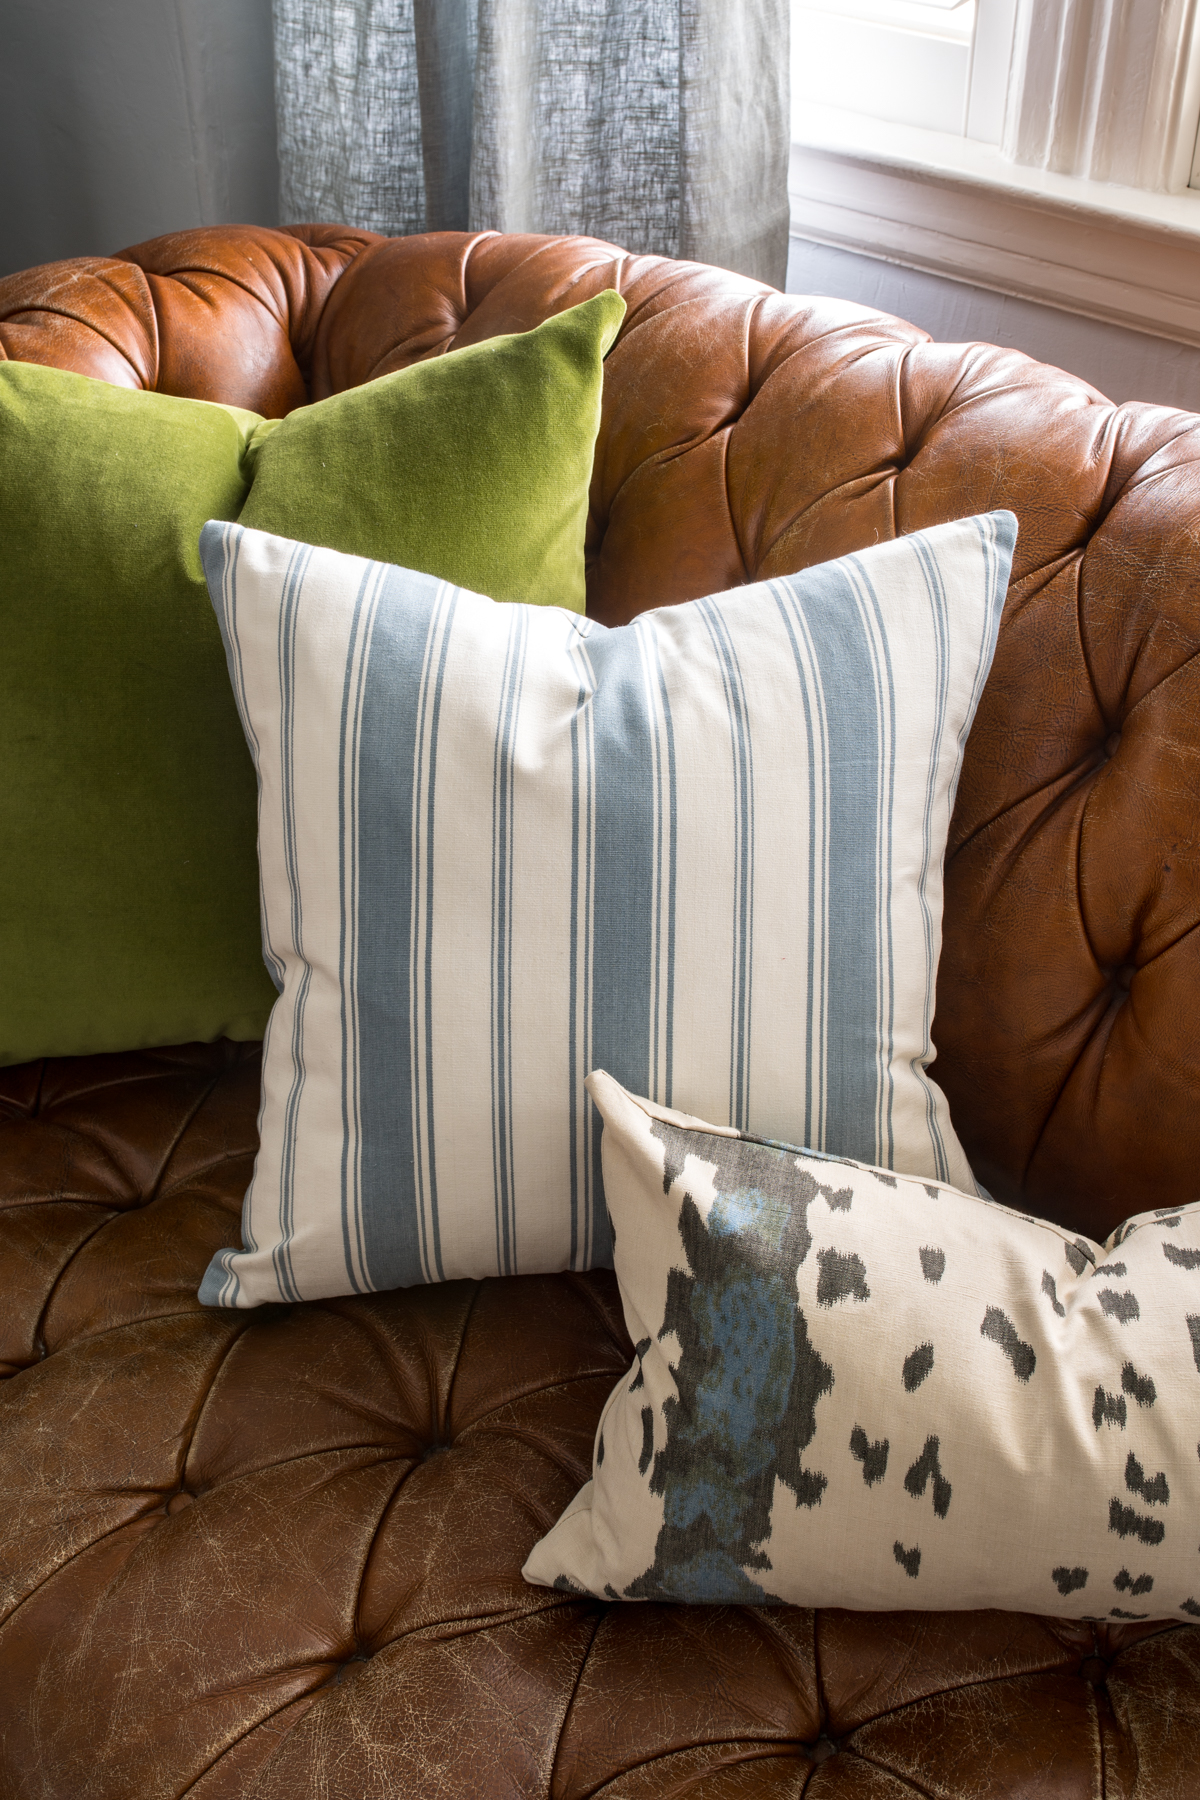 Stacie Flinner Arianna Belle Pillows-9.jpg